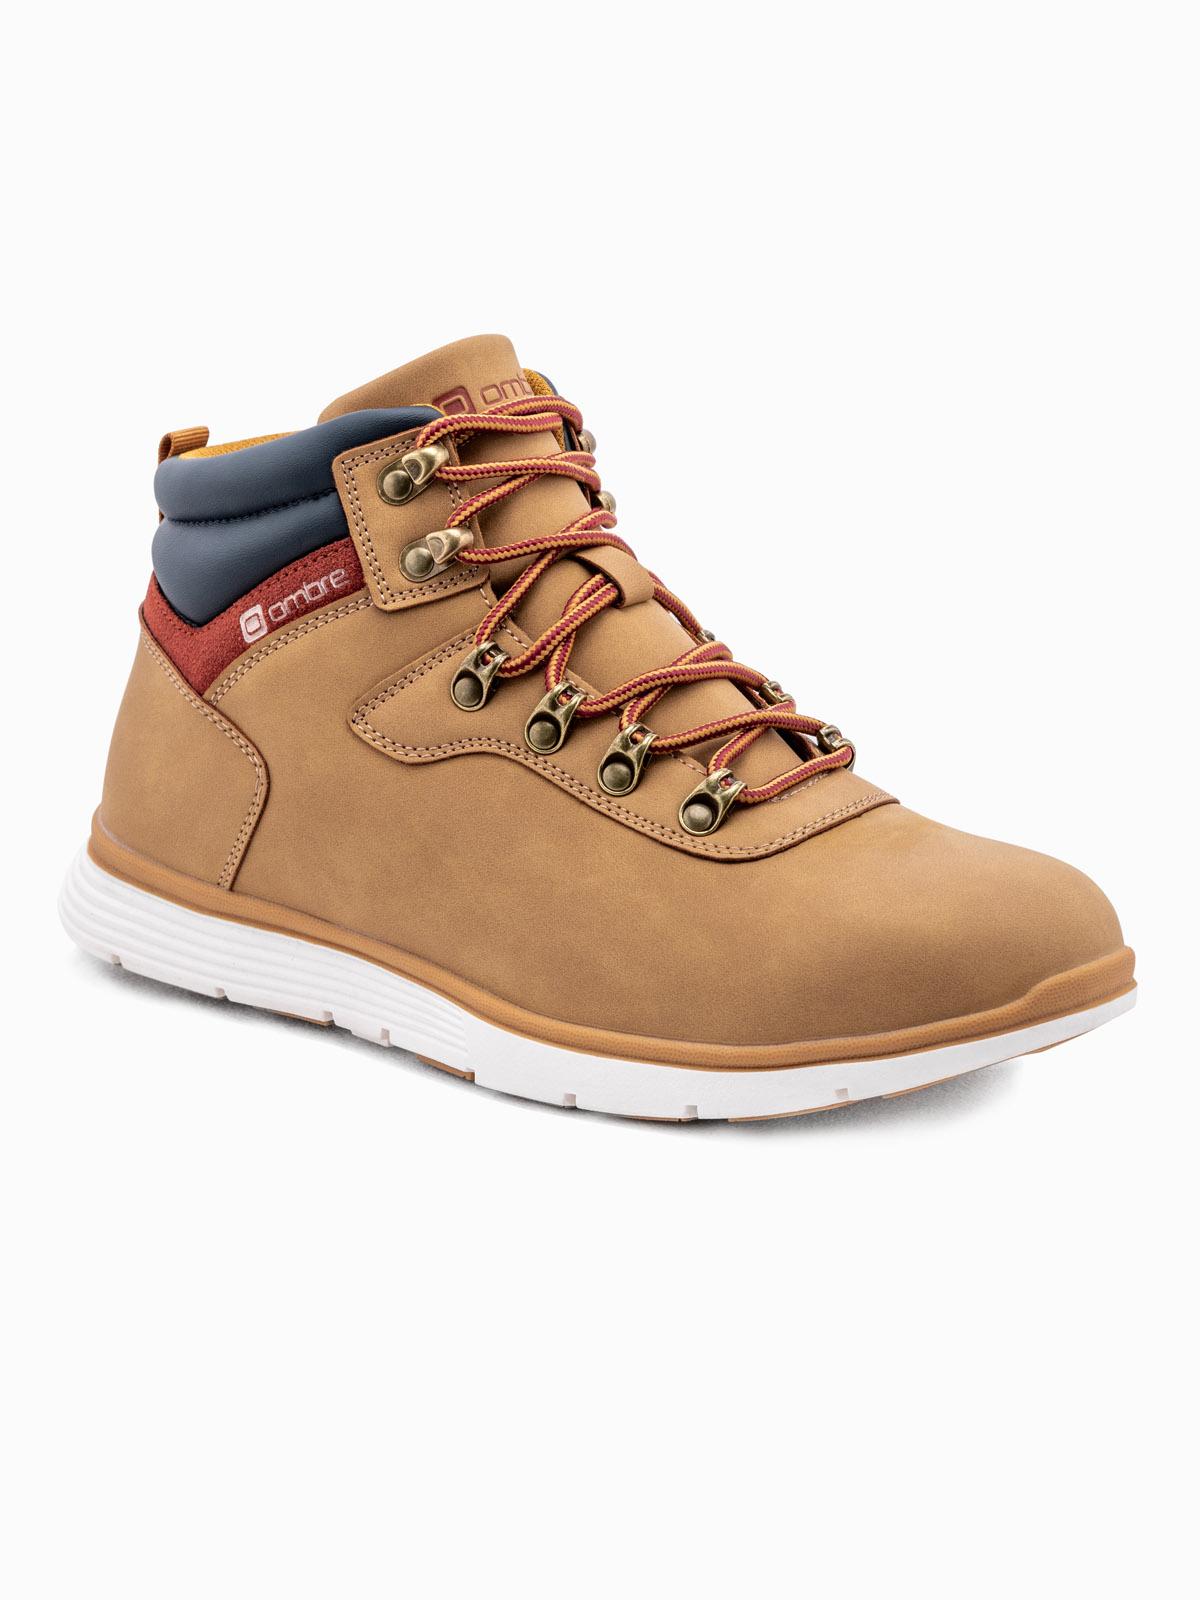 Men's winter shoes trappers T312 beige   MODONE wholesale